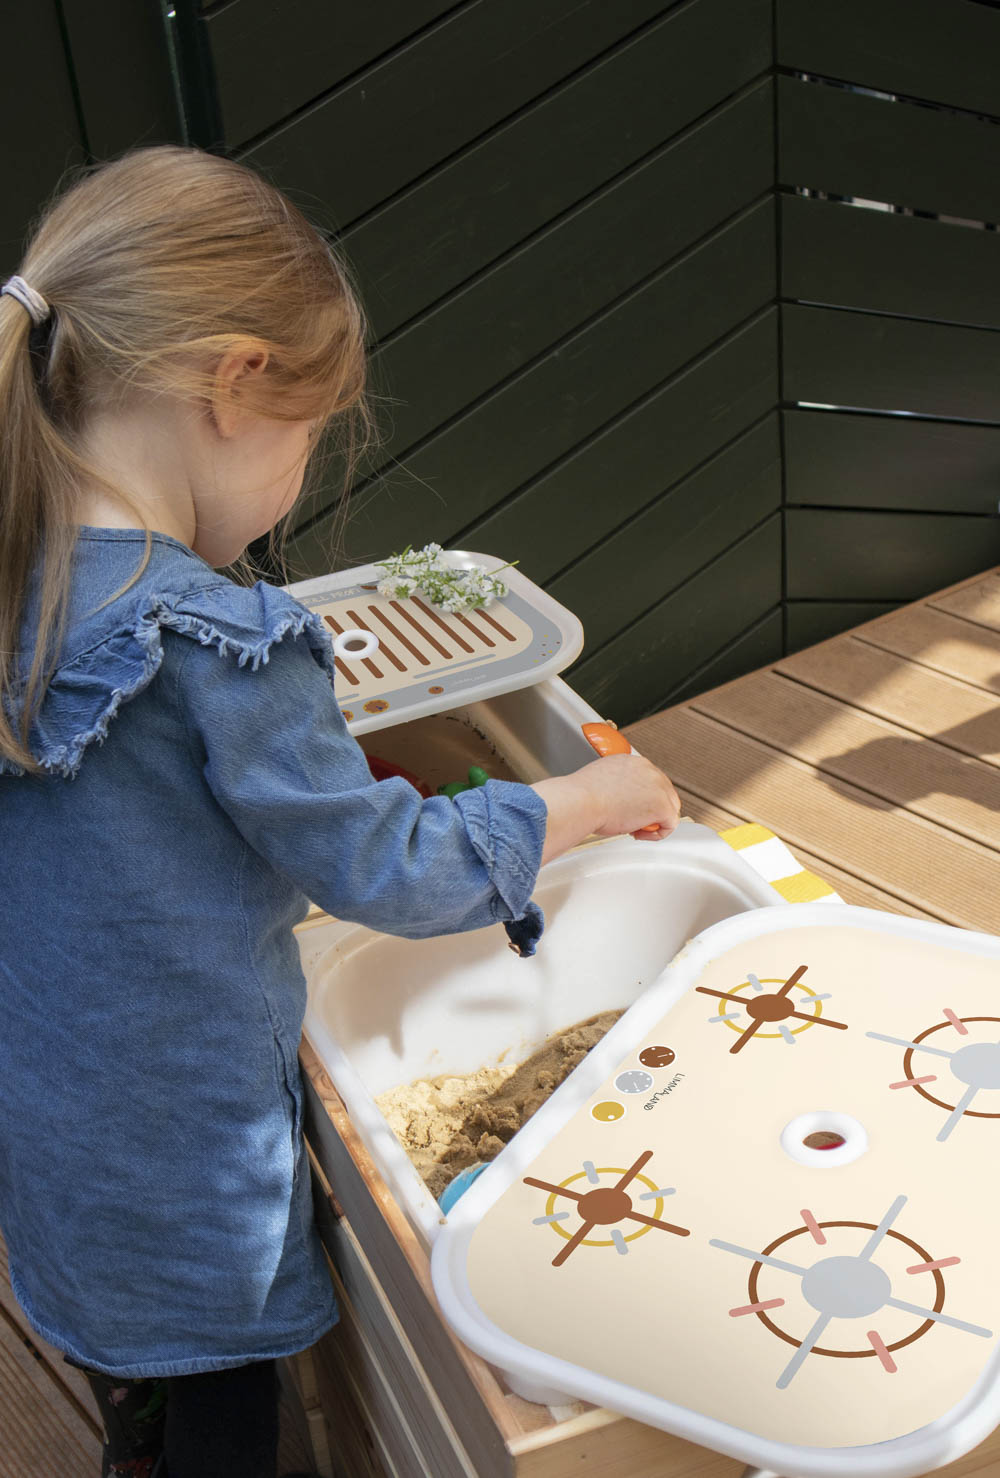 Ikea Trofast Box Kinderherd Erdig sand Teilansicht Spiel